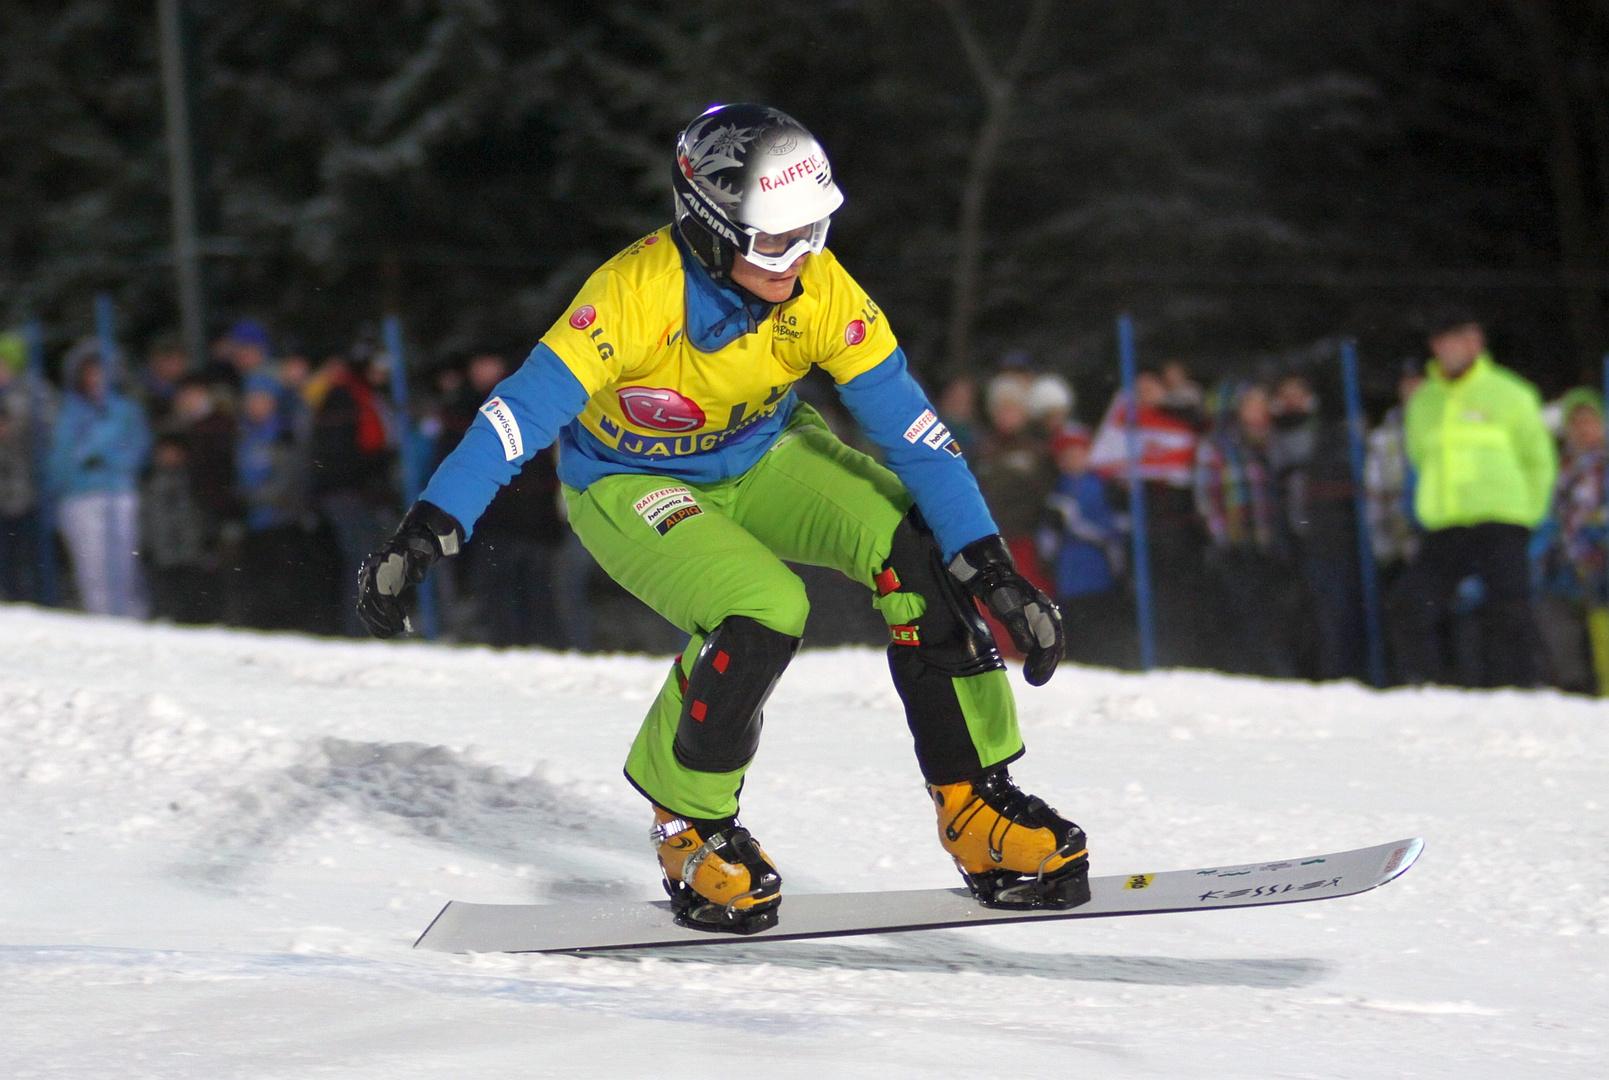 Worldcup Slalom Jauerling